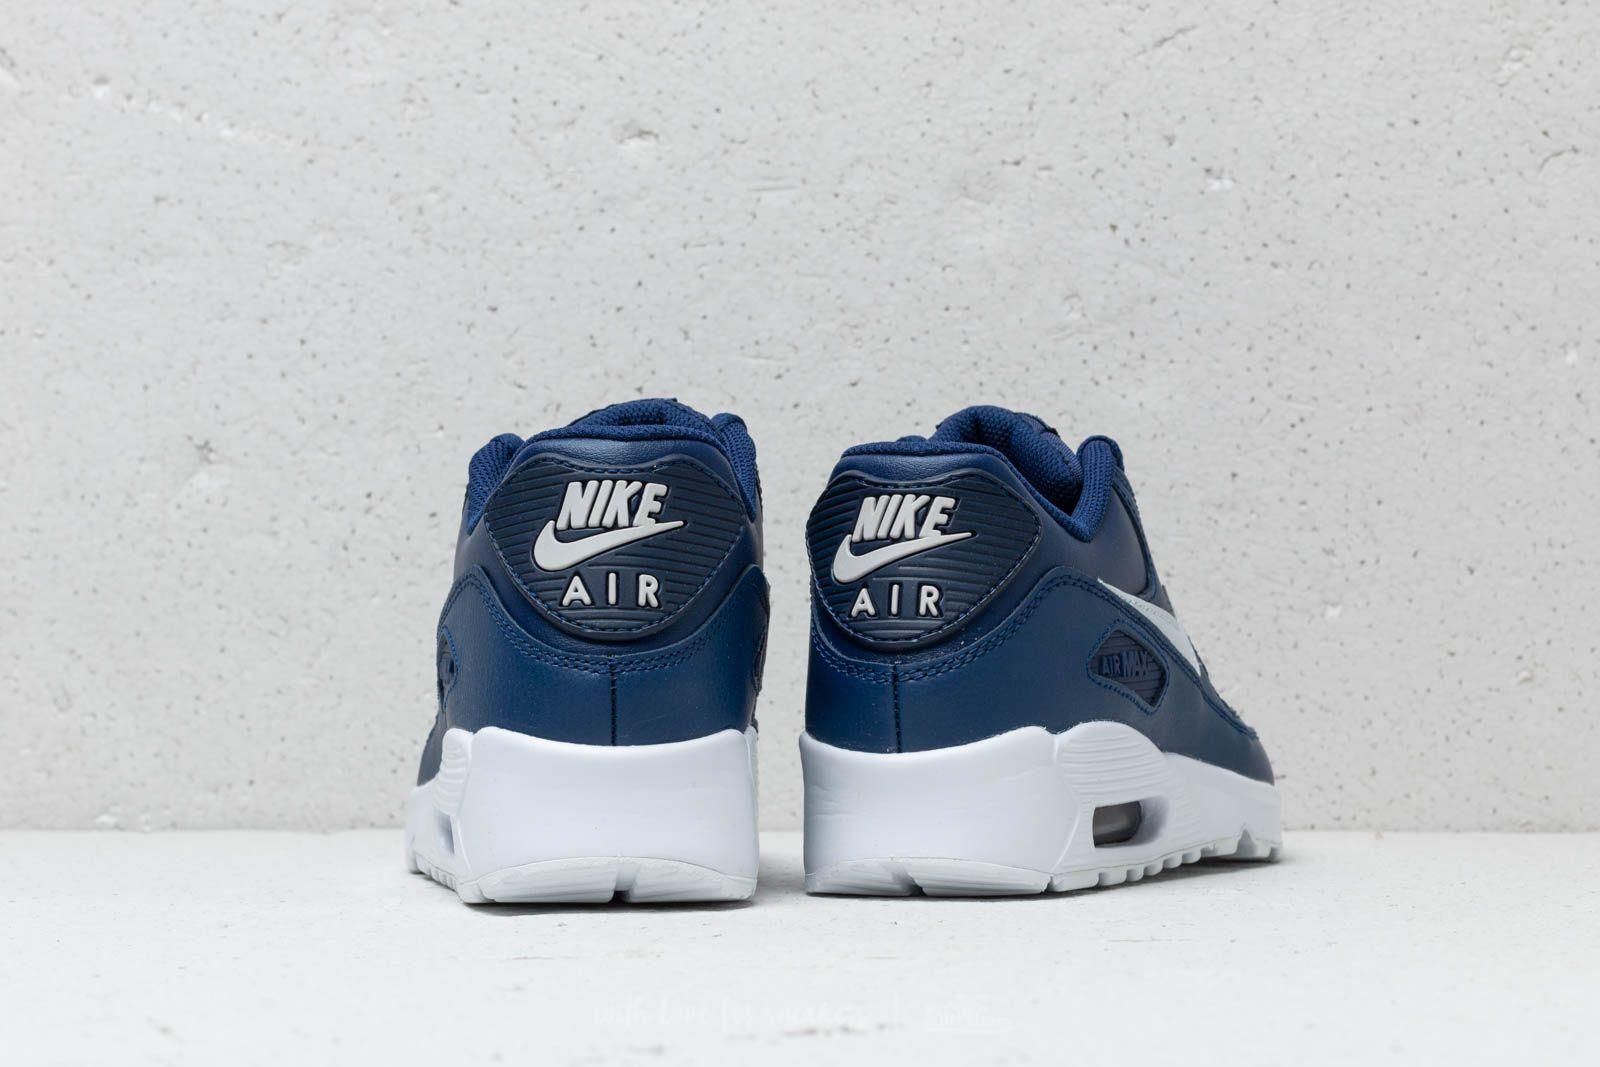 Nike Air MAx 90 LTR (GS) Blue Void Pure Platinum White | Footshop